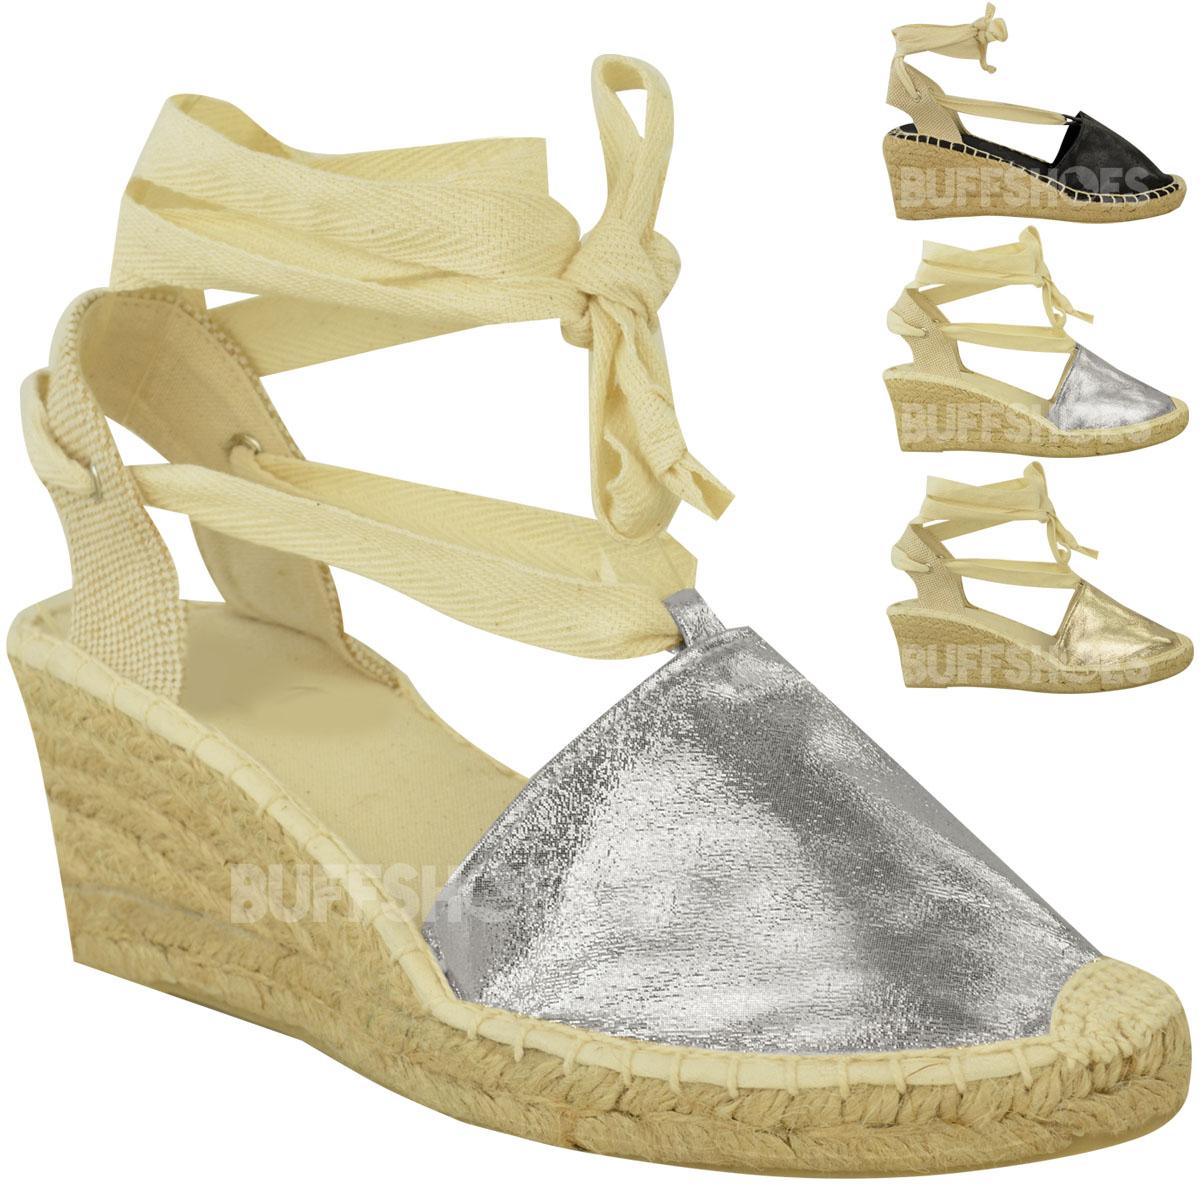 Womens Ladies Summer Wedges Low Heel Espadrilles Lace Up ...